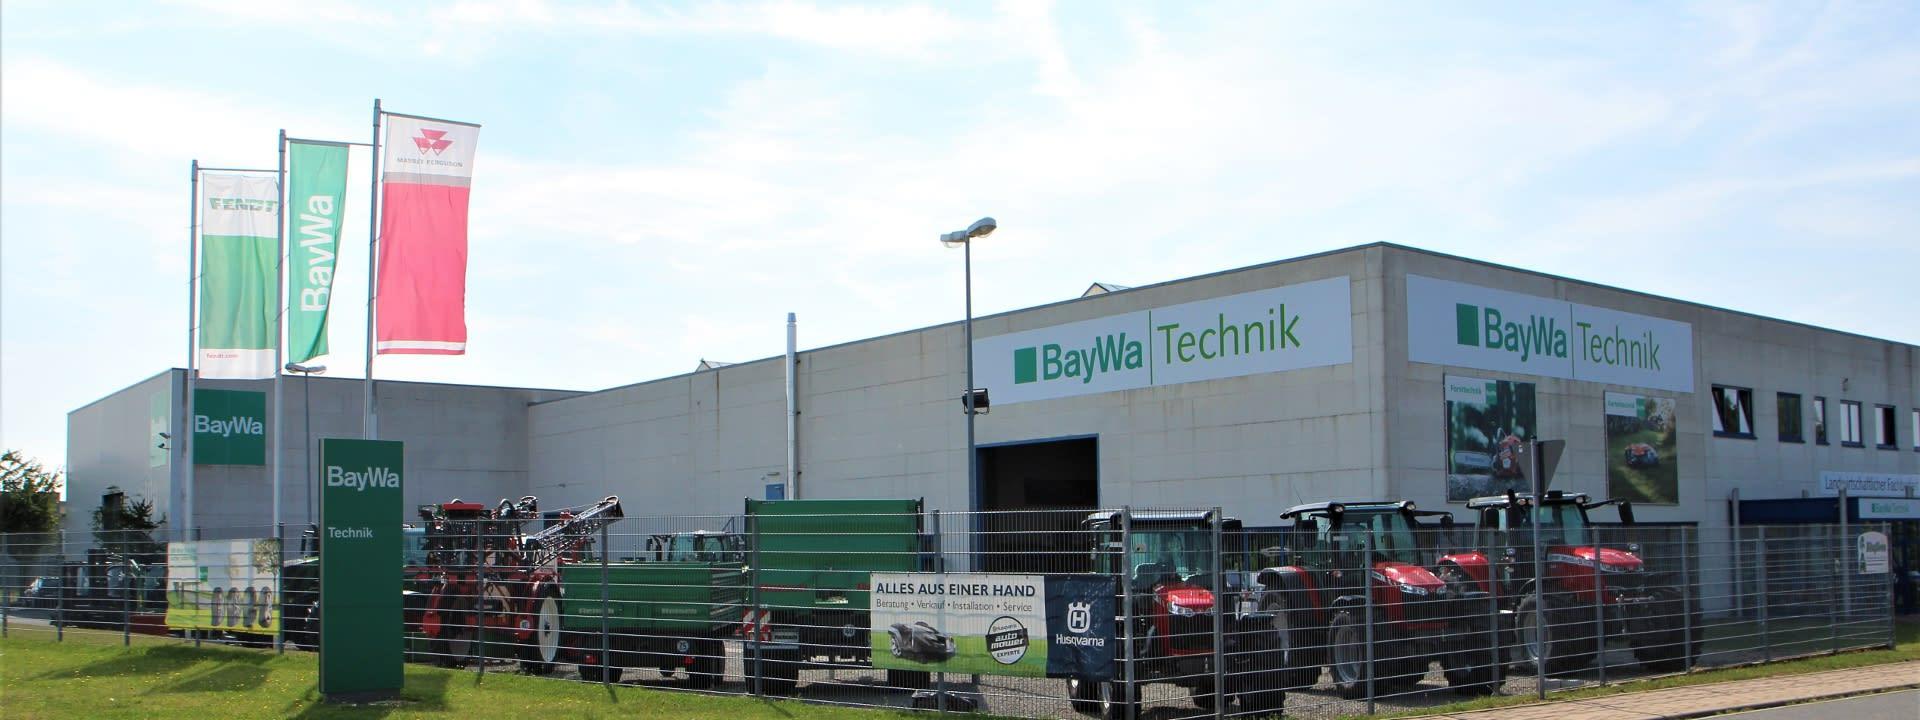 BayWa Technik Giebelstadt